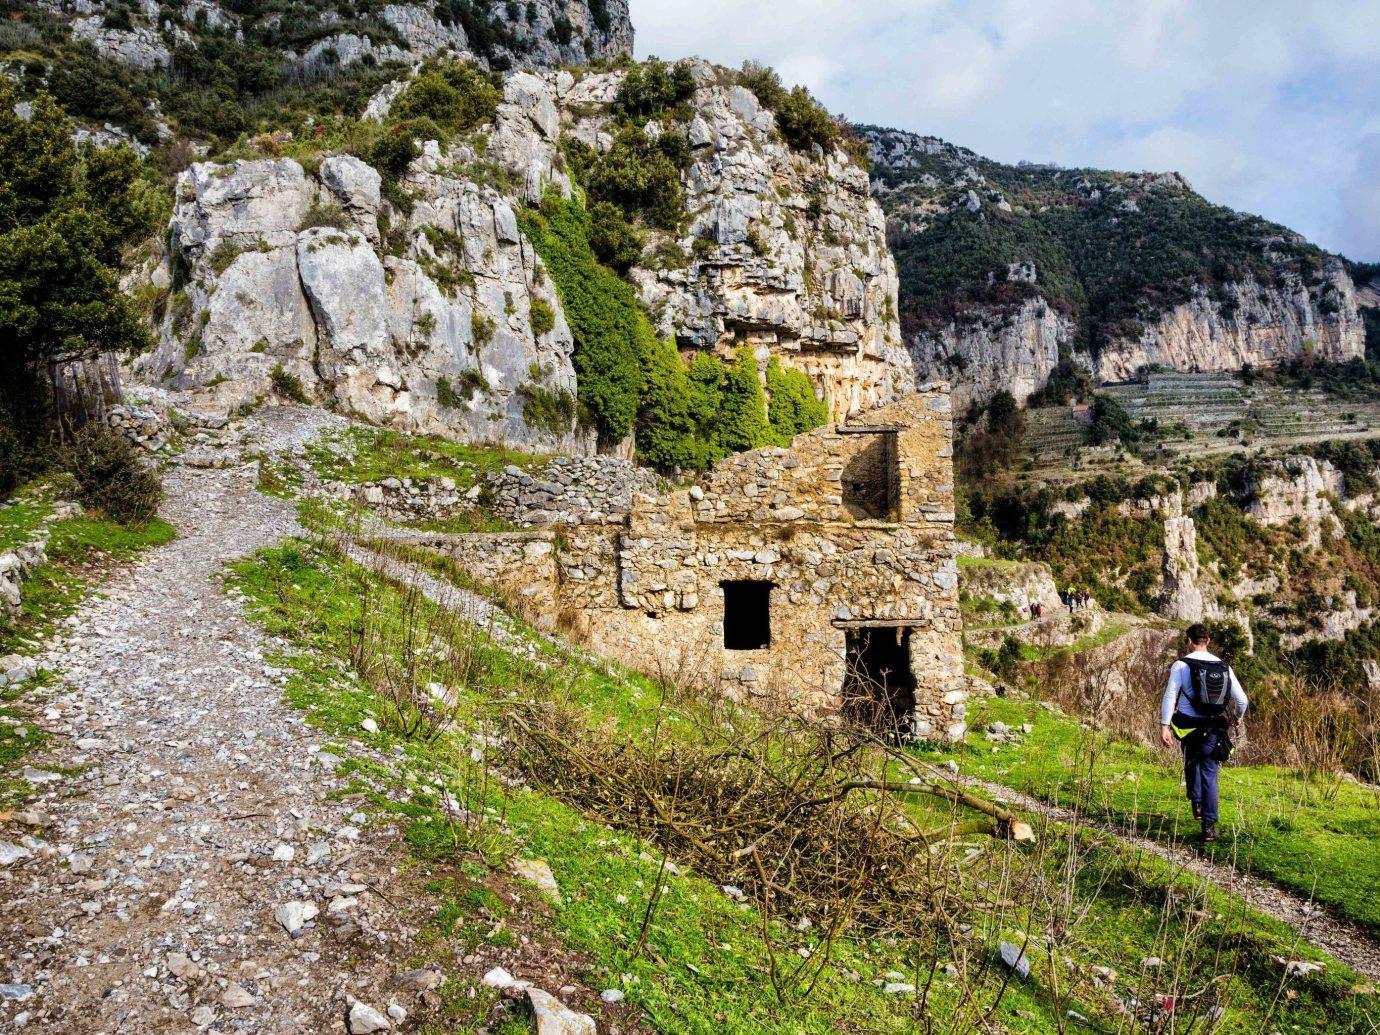 europe Outdoors + Adventure Trip Ideas mountain rock geological phenomenon sky Ruins mountain range Village escarpment grass geology landscape ancient history tree outcrop alps tourism